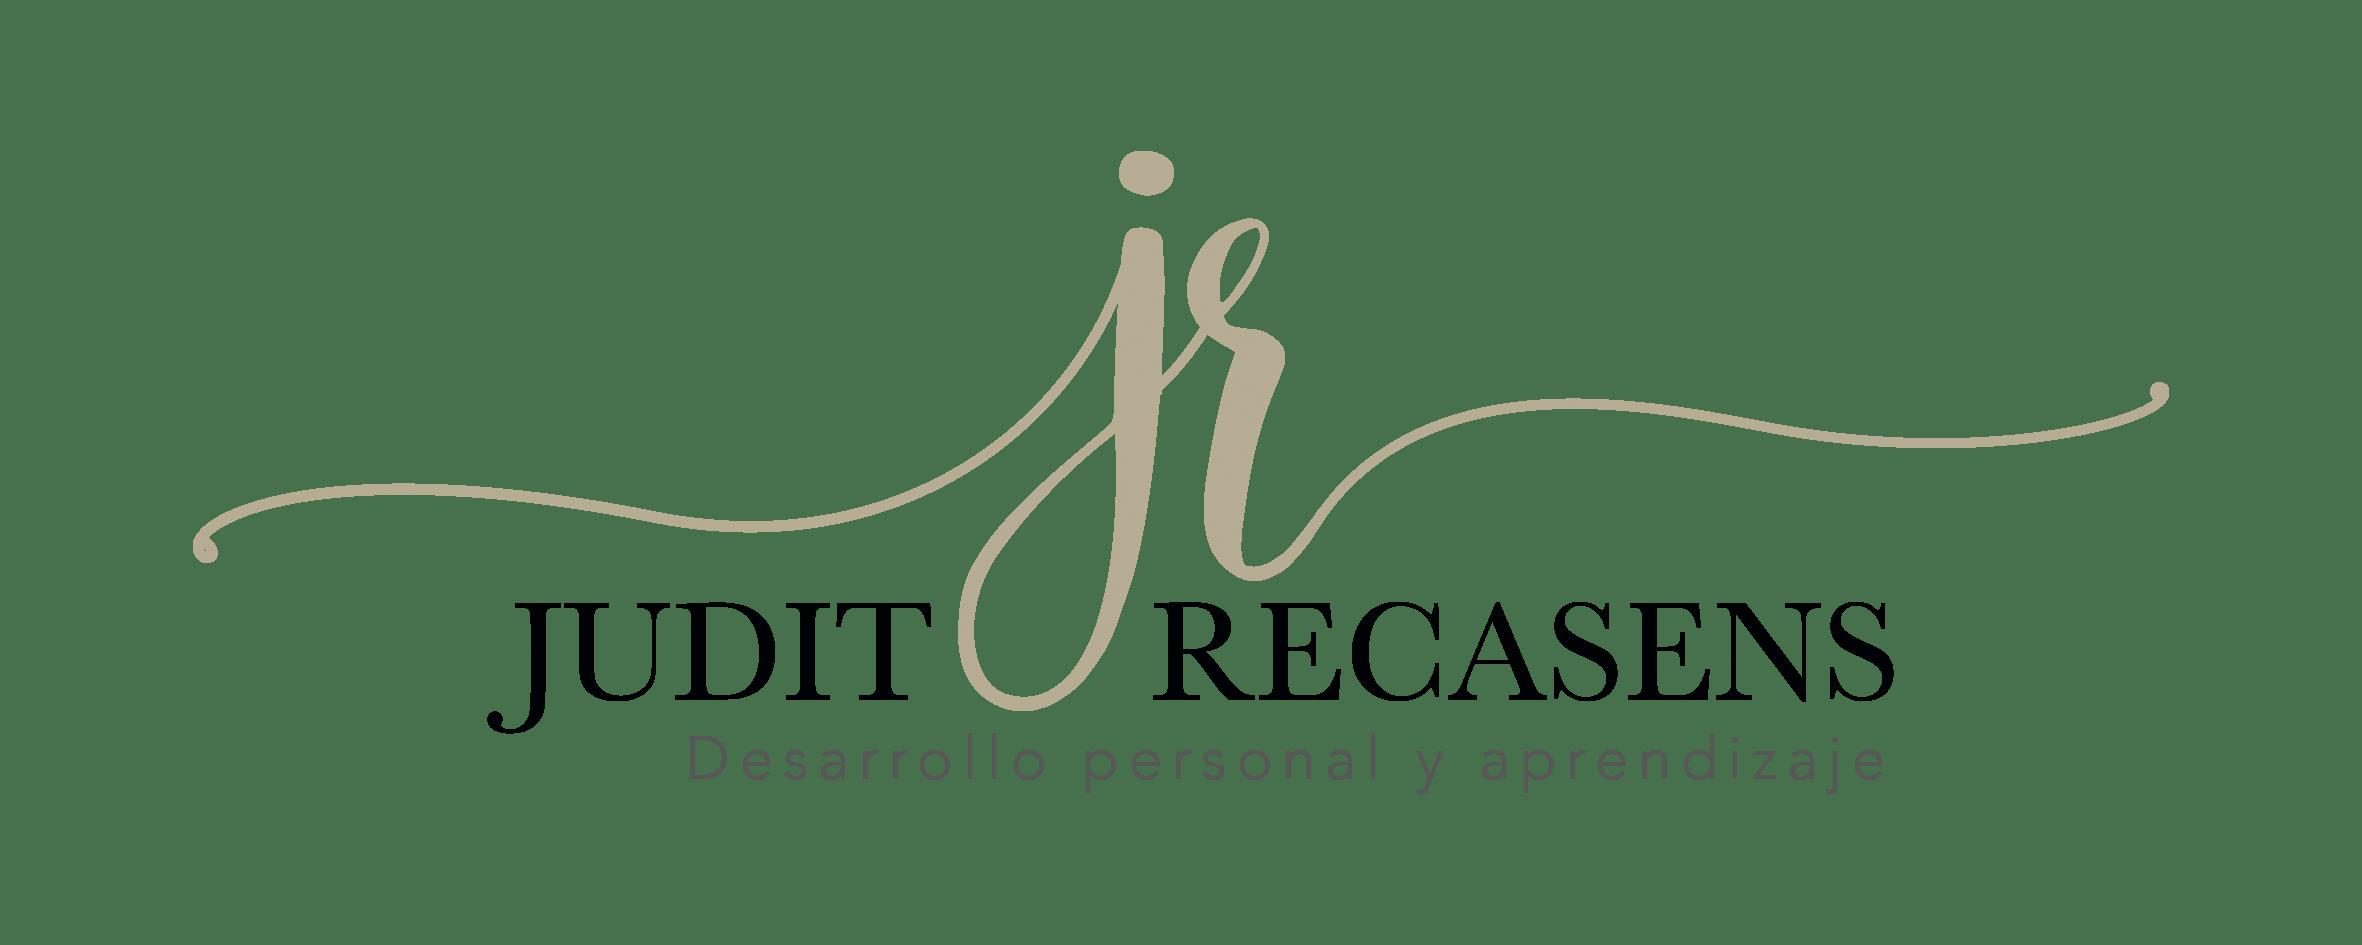 LOGO-COLOR-JUDIT-RECASENS